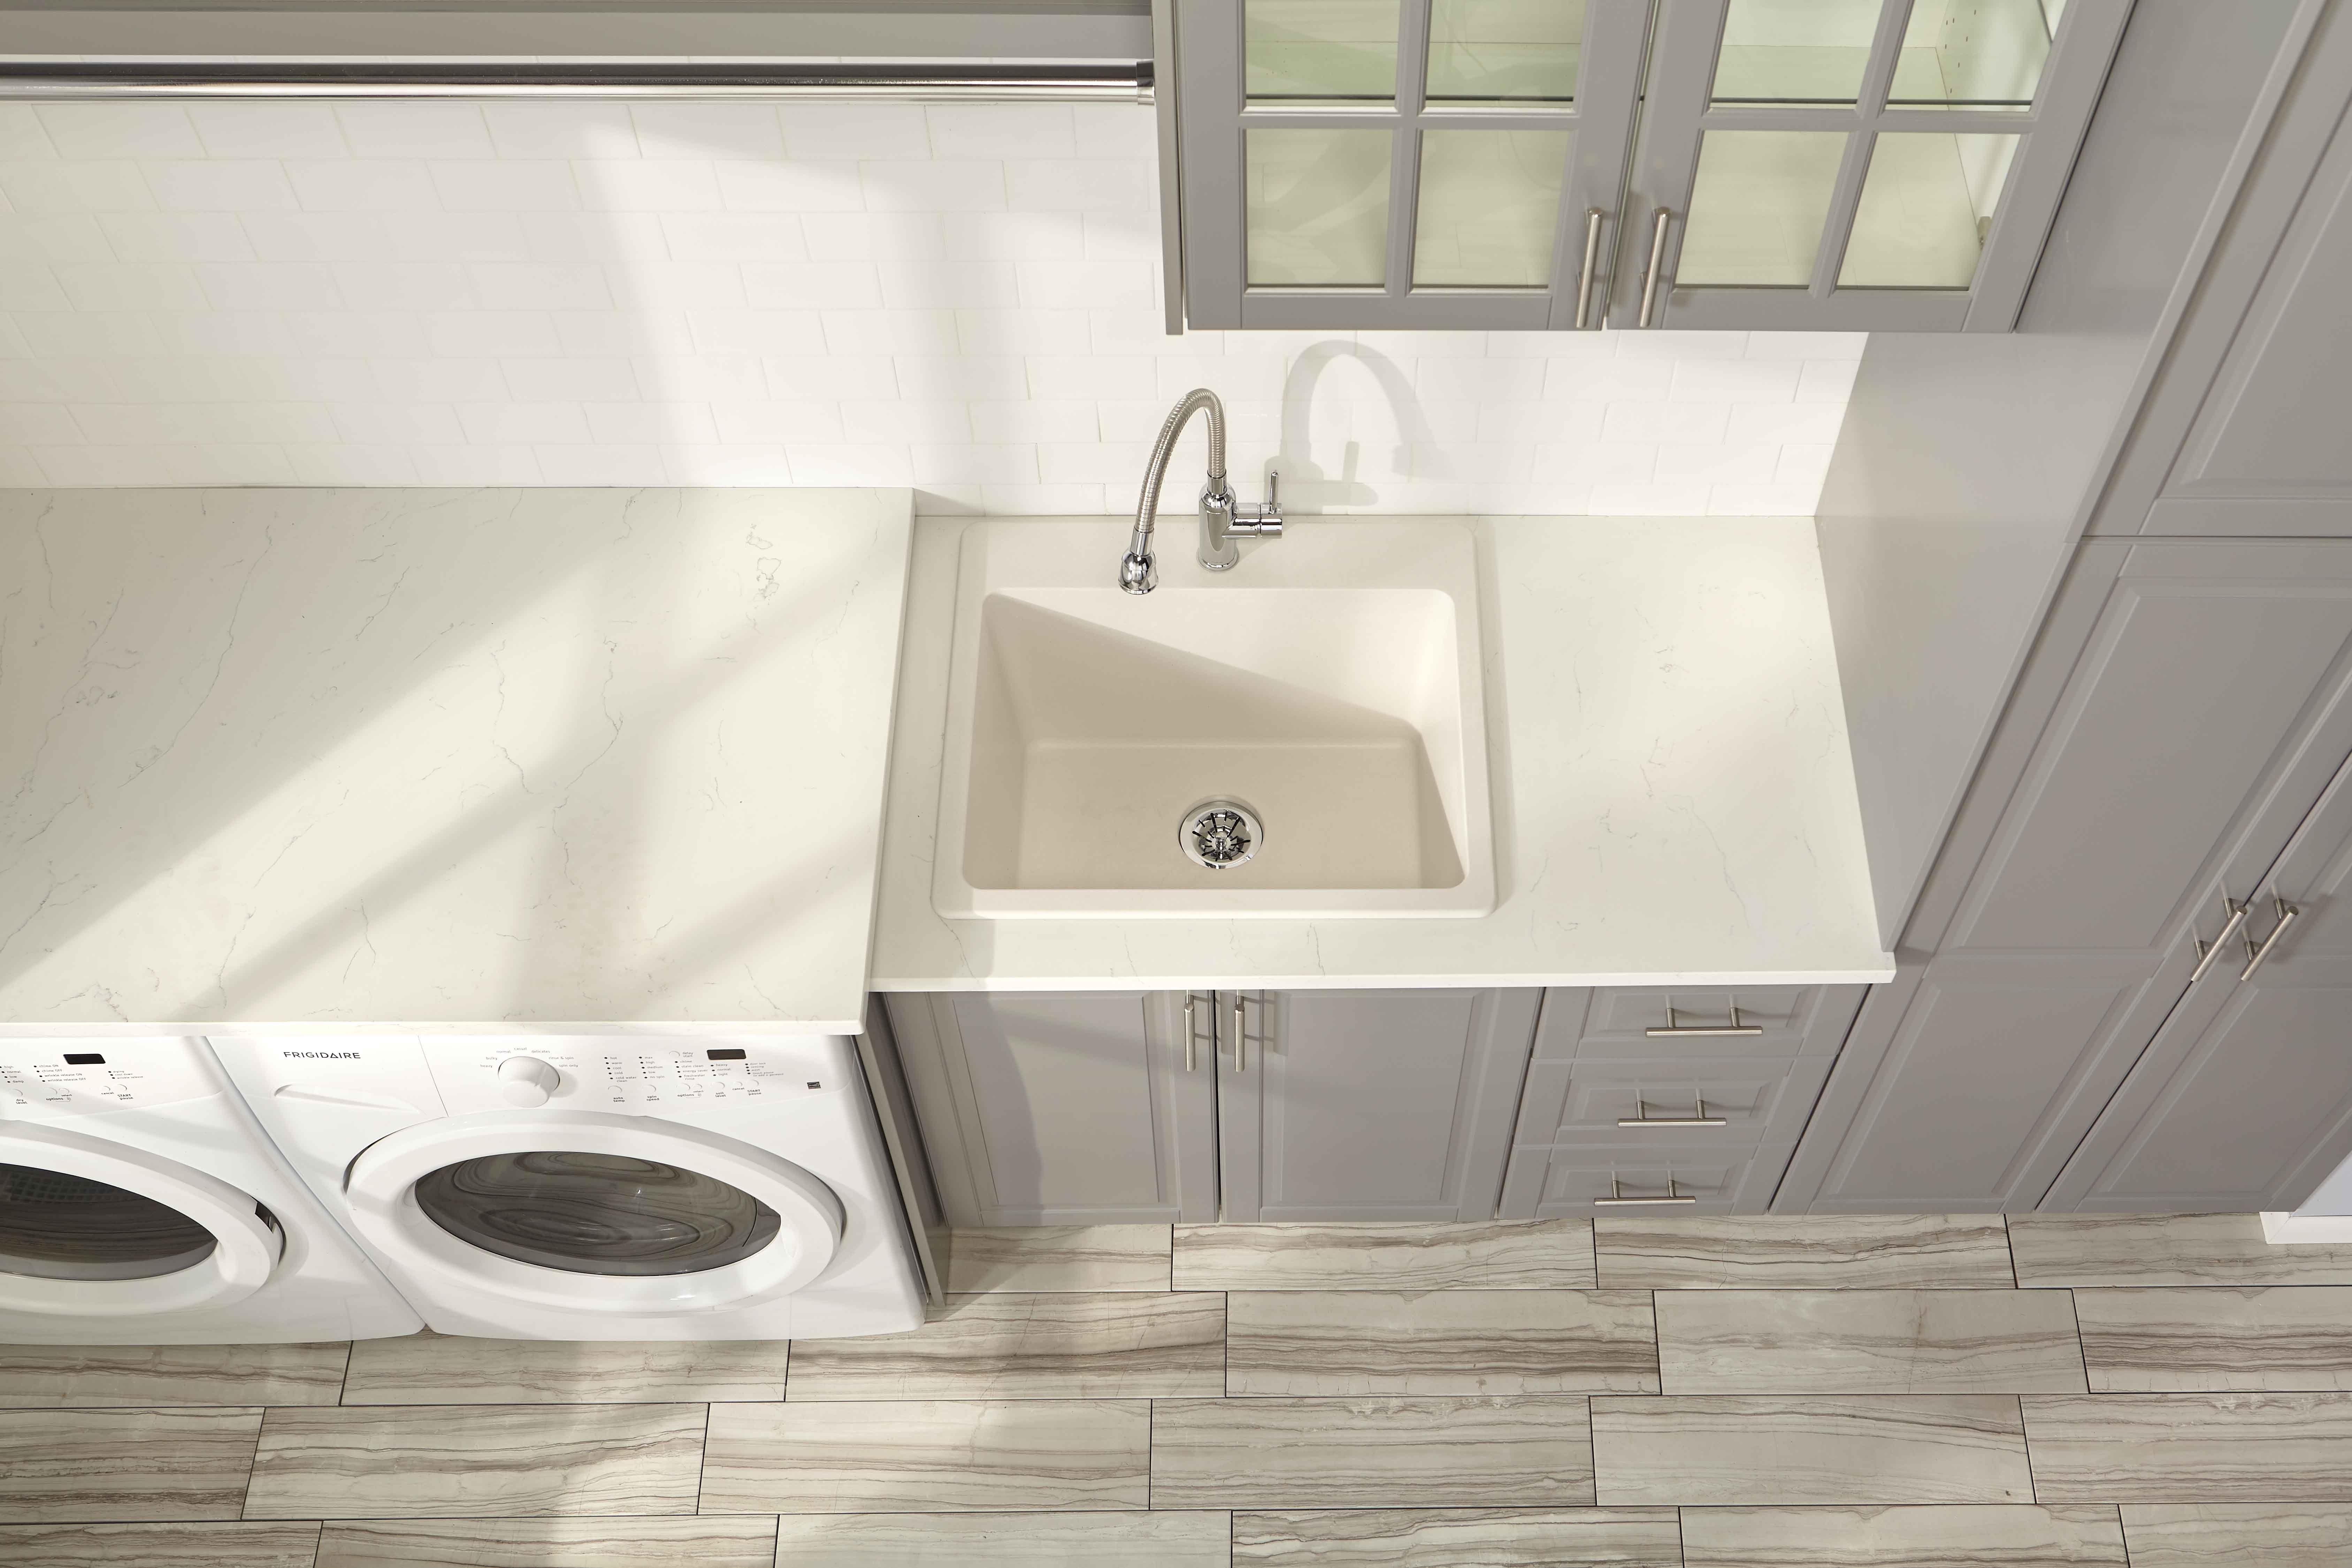 Quartz Classic 25 X 22 X 11 13 16 Drop In Laundry Sink With